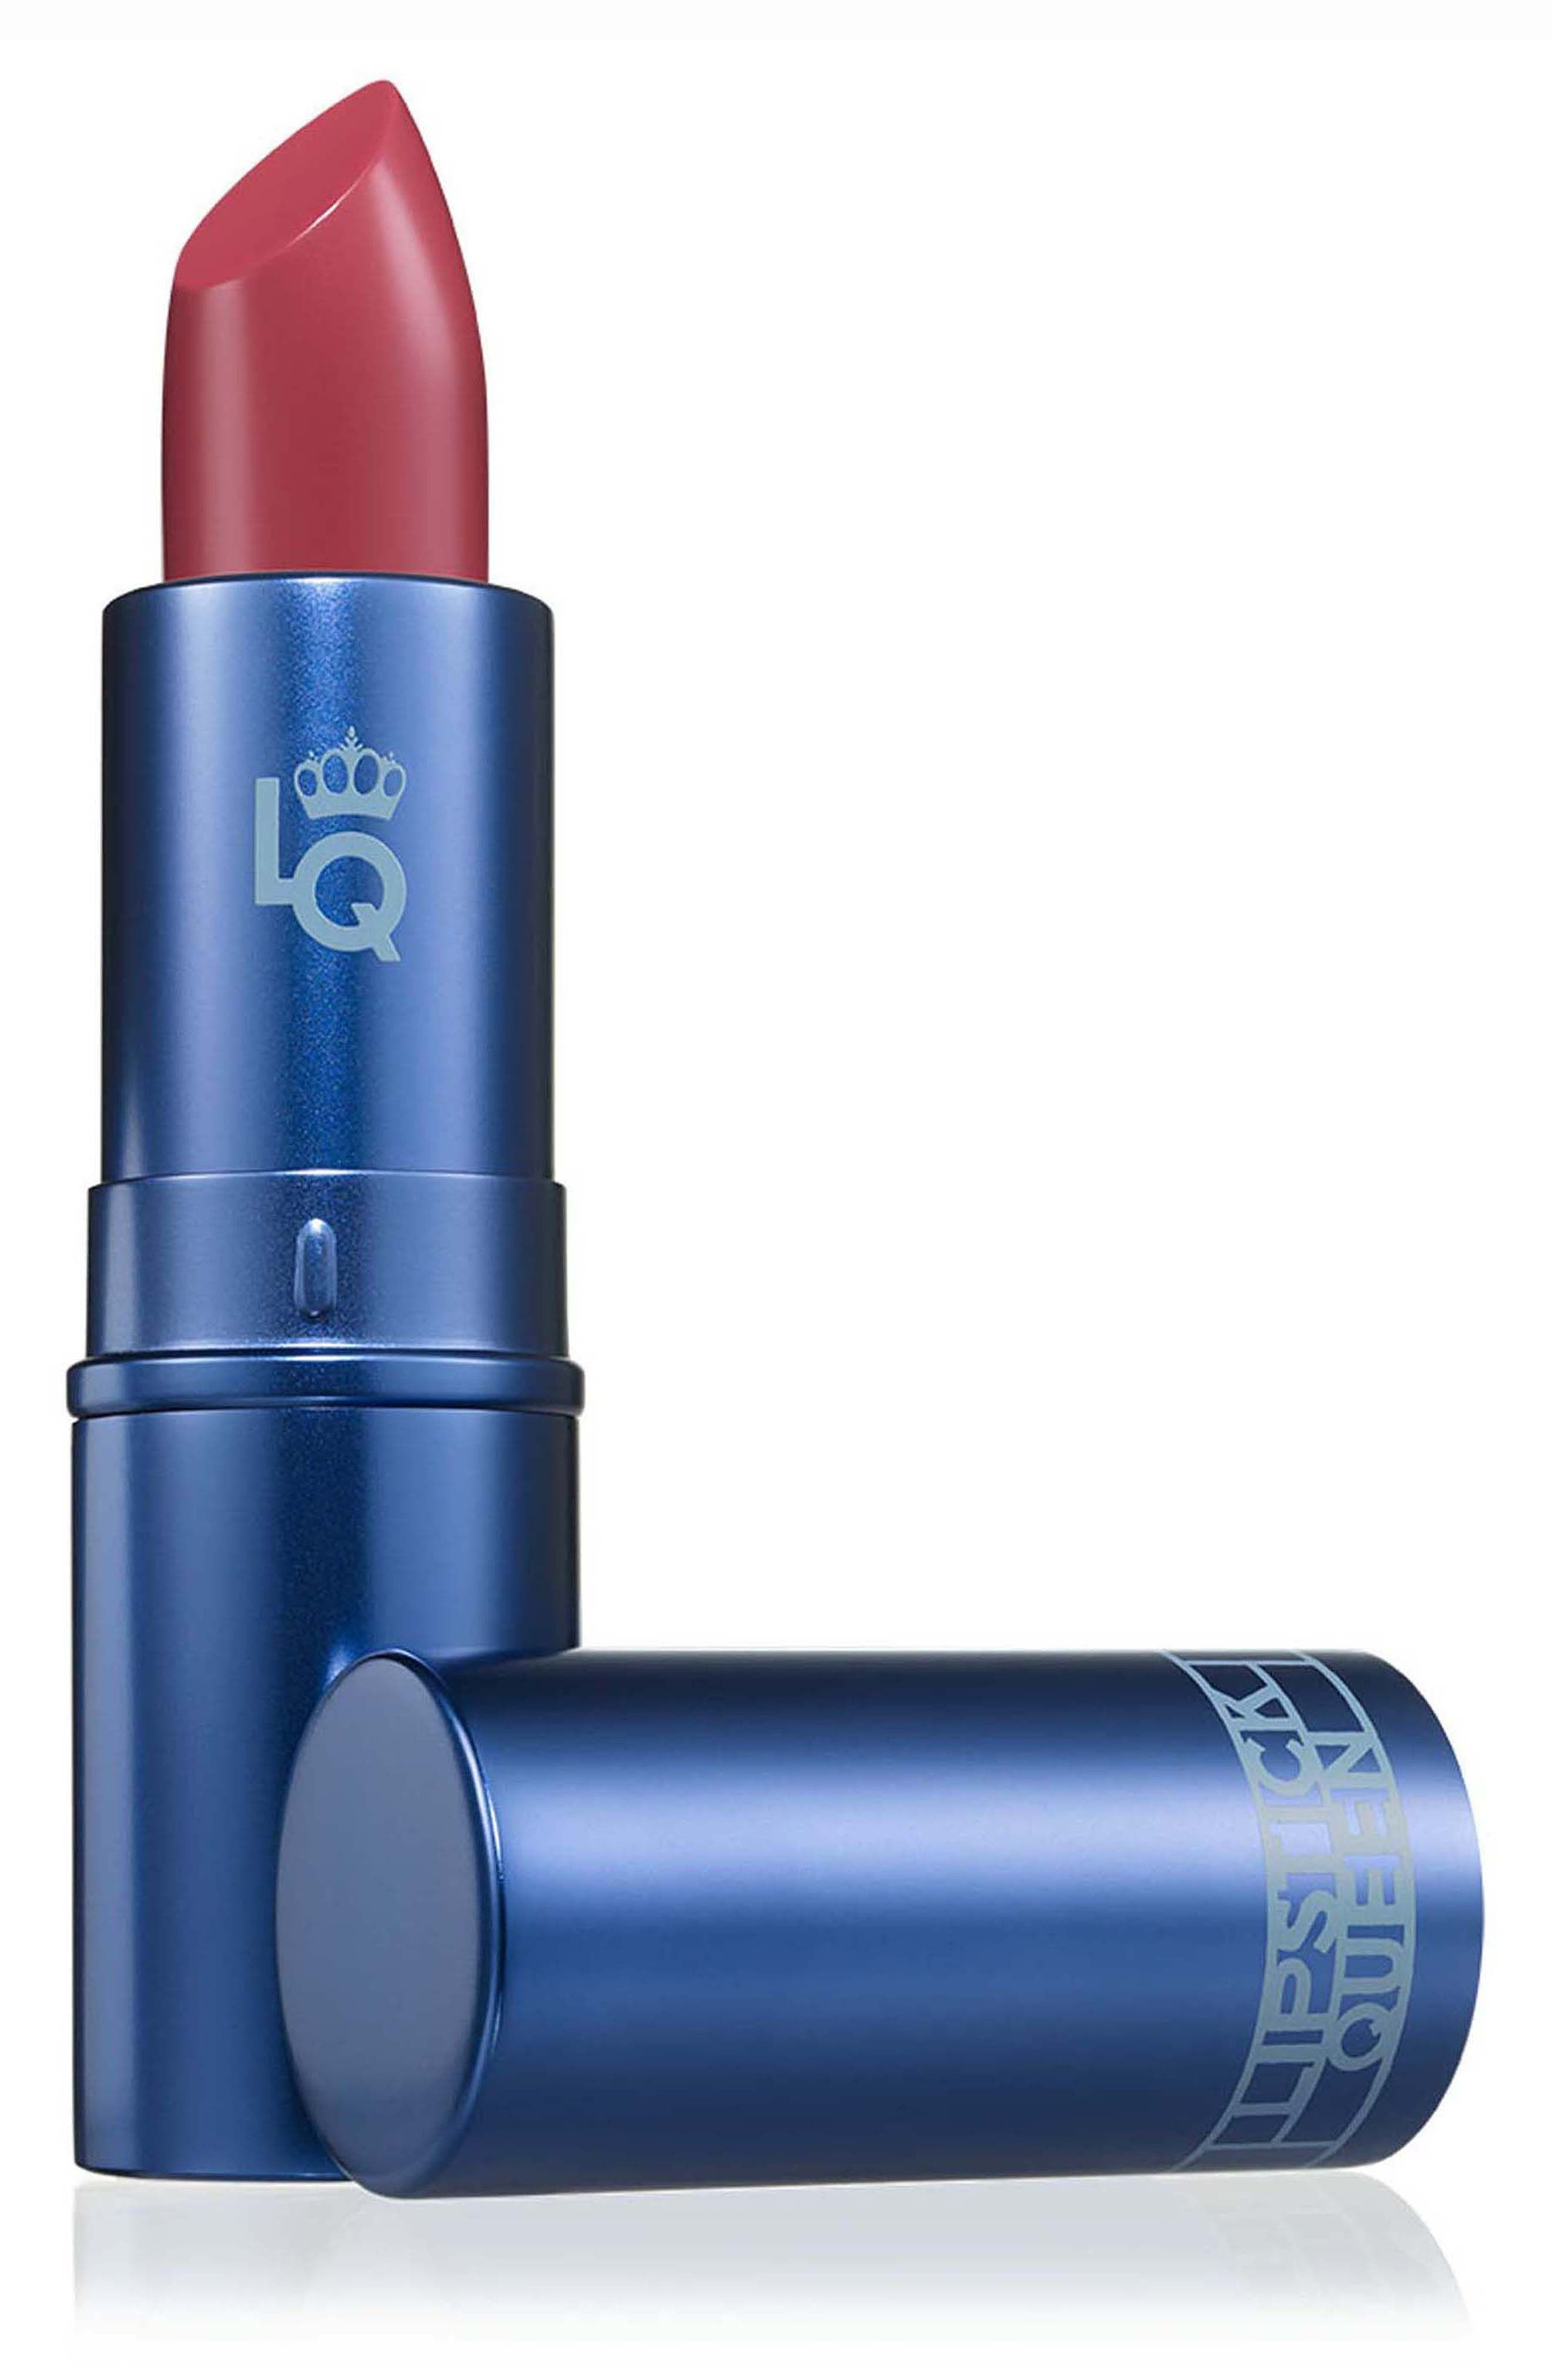 Main Image - SPACE.NK.apothecary Lipstick Queen Jean Queen Lipstick